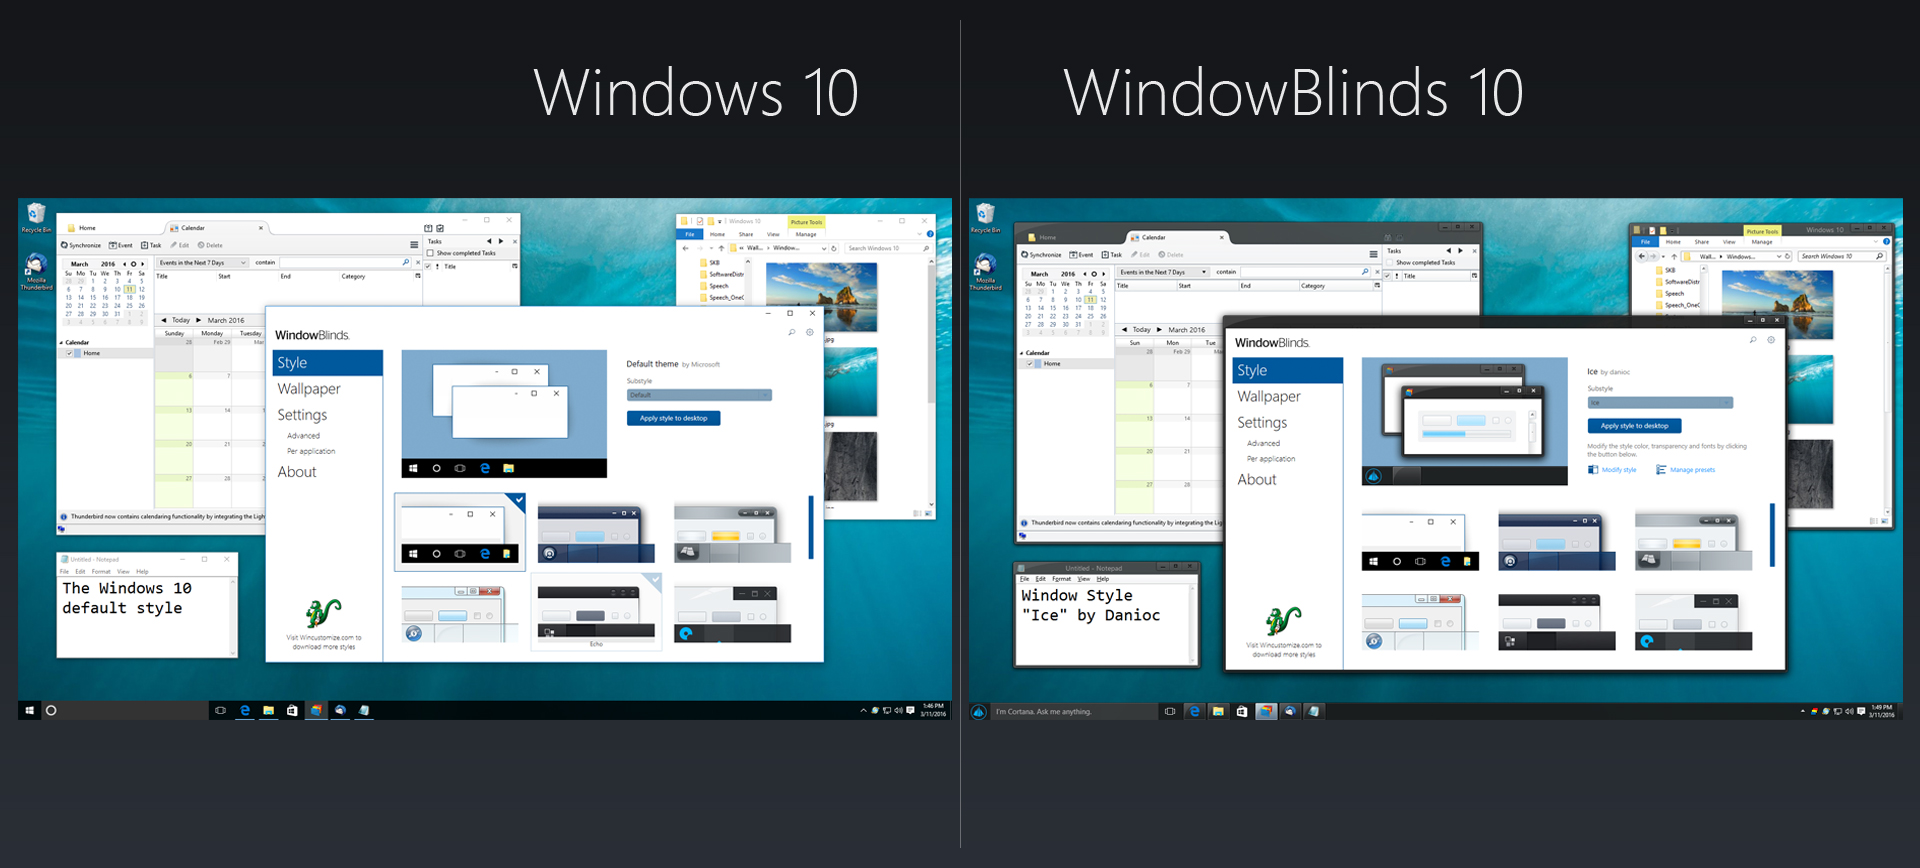 Download WindowBlinds for free